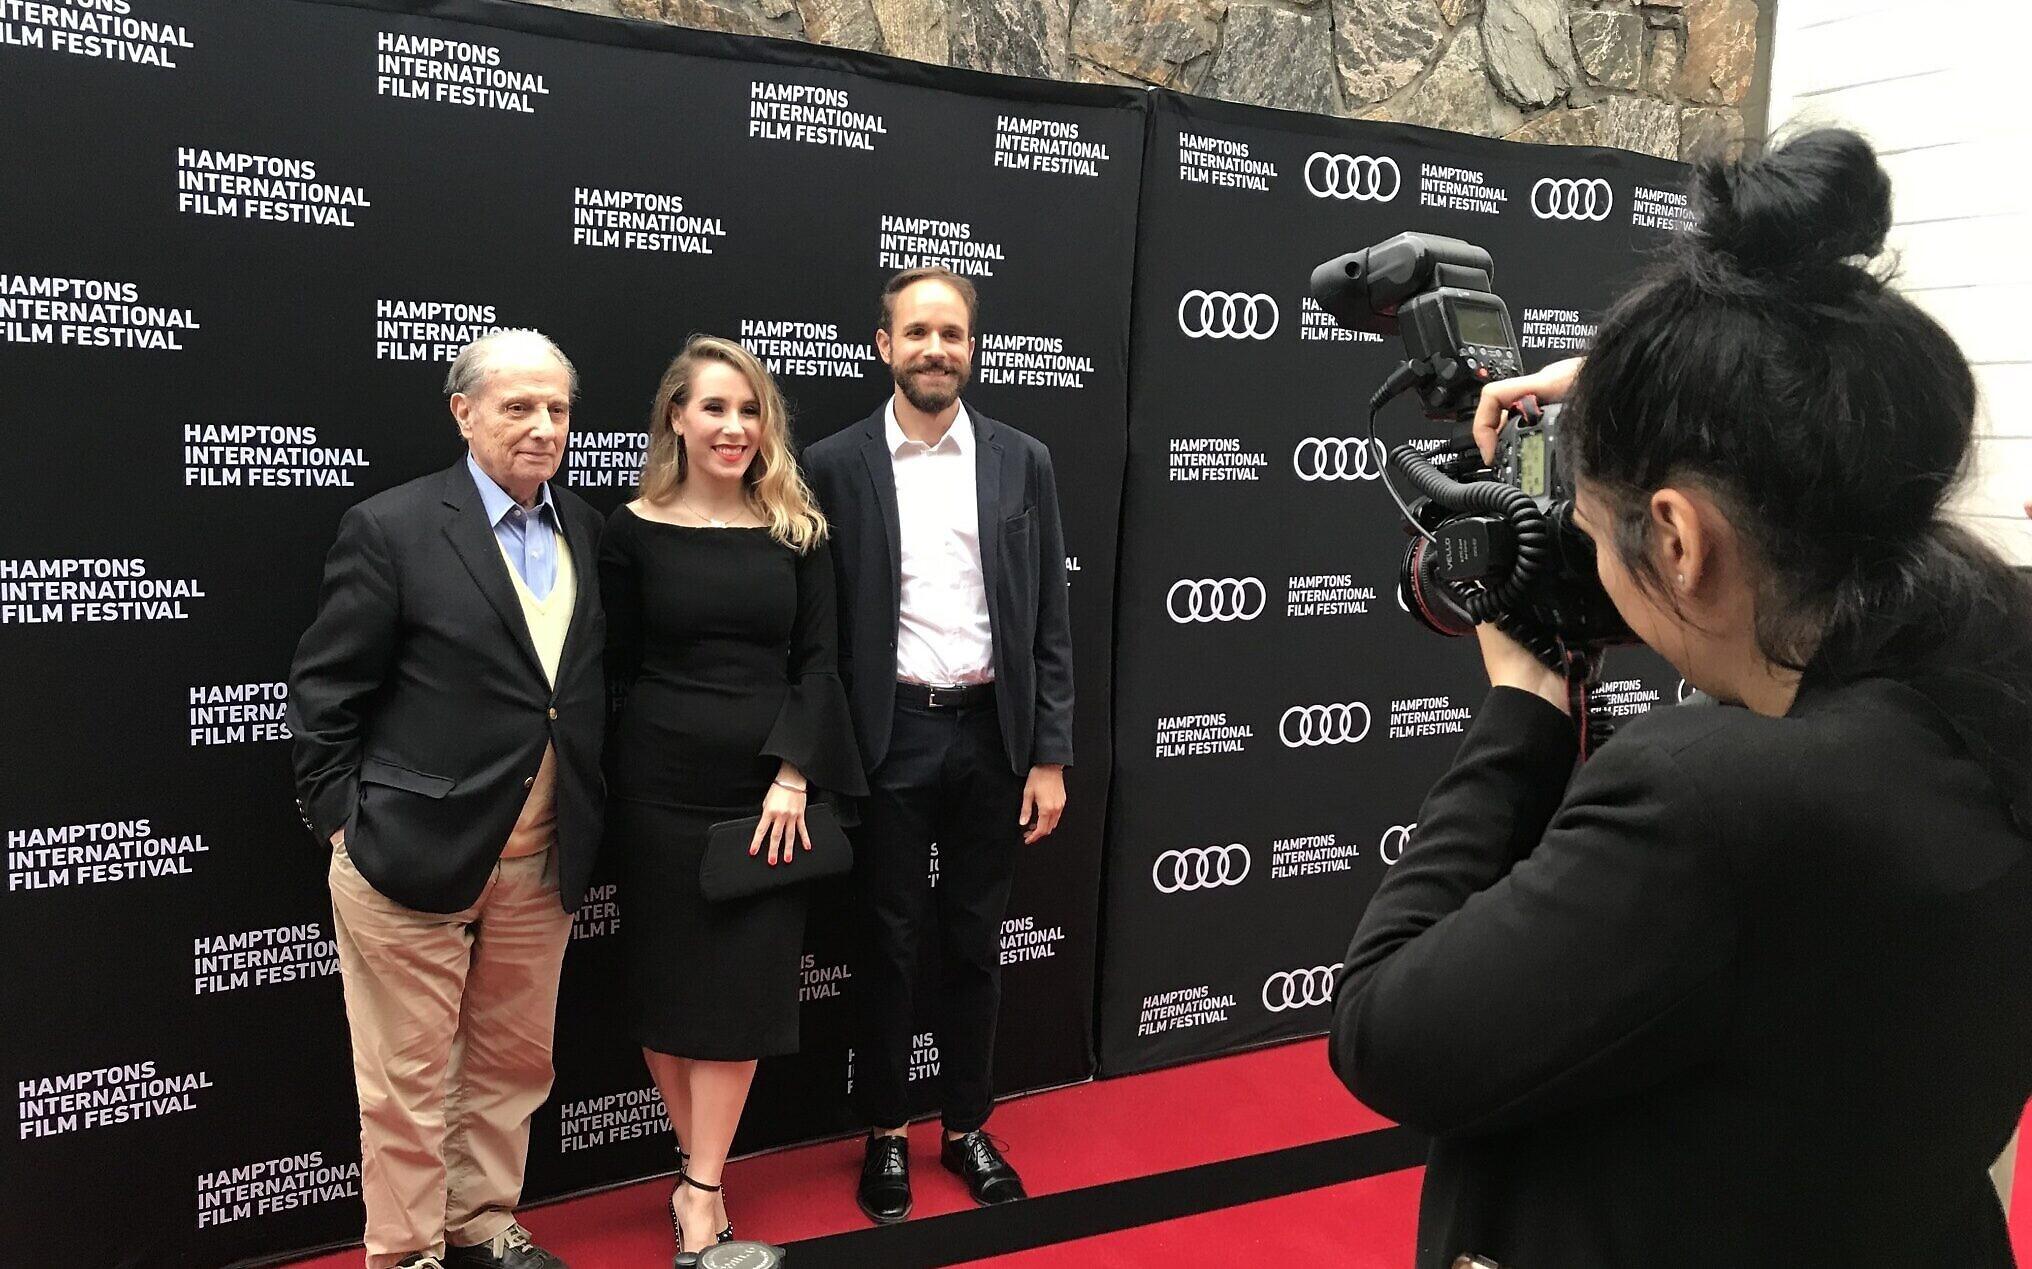 Henri Dauman, Nicole Suerez, and Peter Kenneth Jones at the 2018 premiere of 'Henri Dauman: Looking Up' at the Hamptons International Film Festival. (Courtesy)